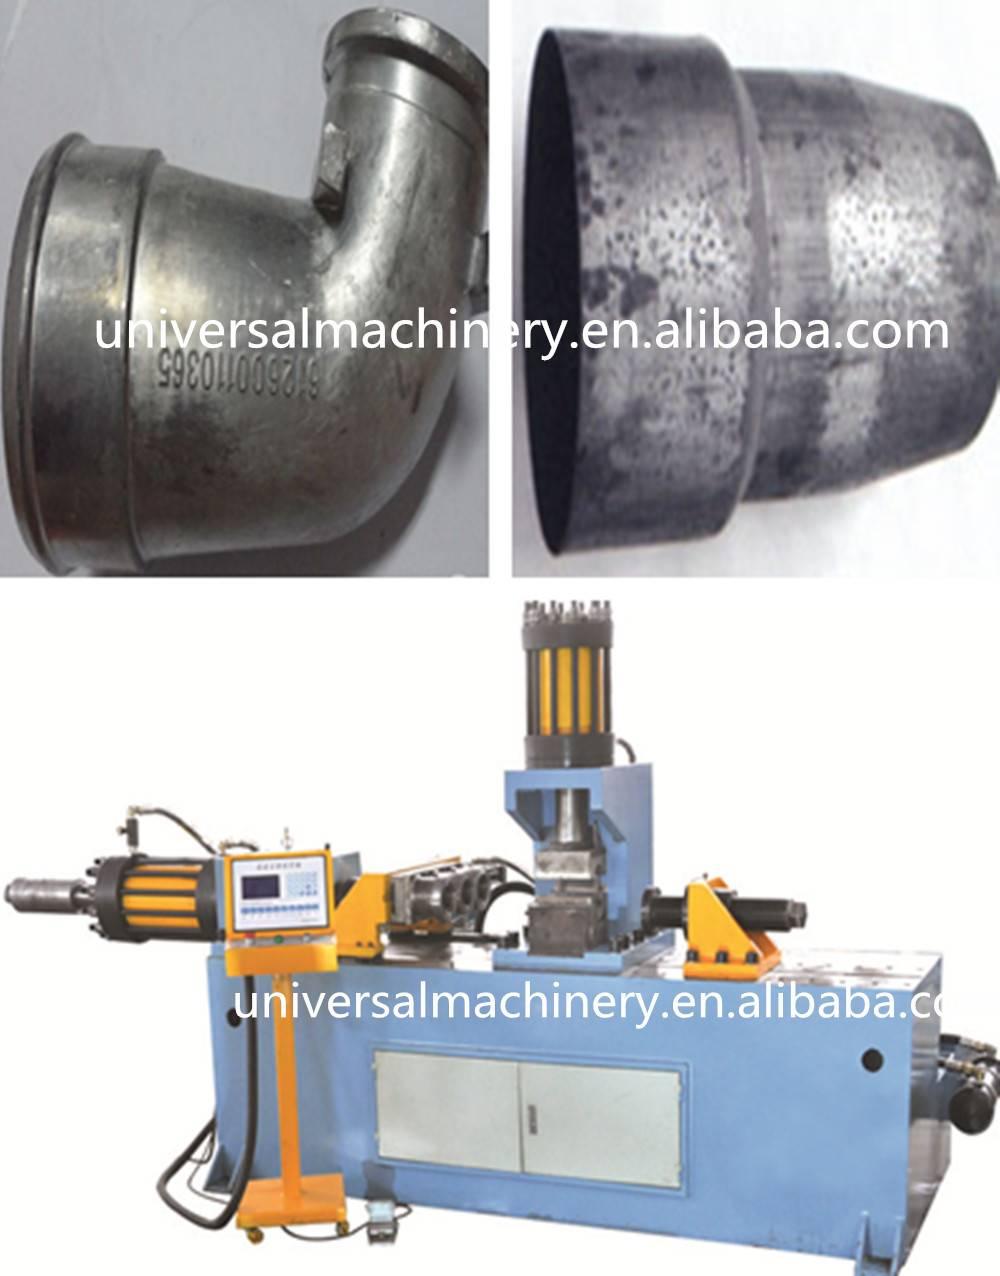 Global warranty China factory price Tube Expanding Machine